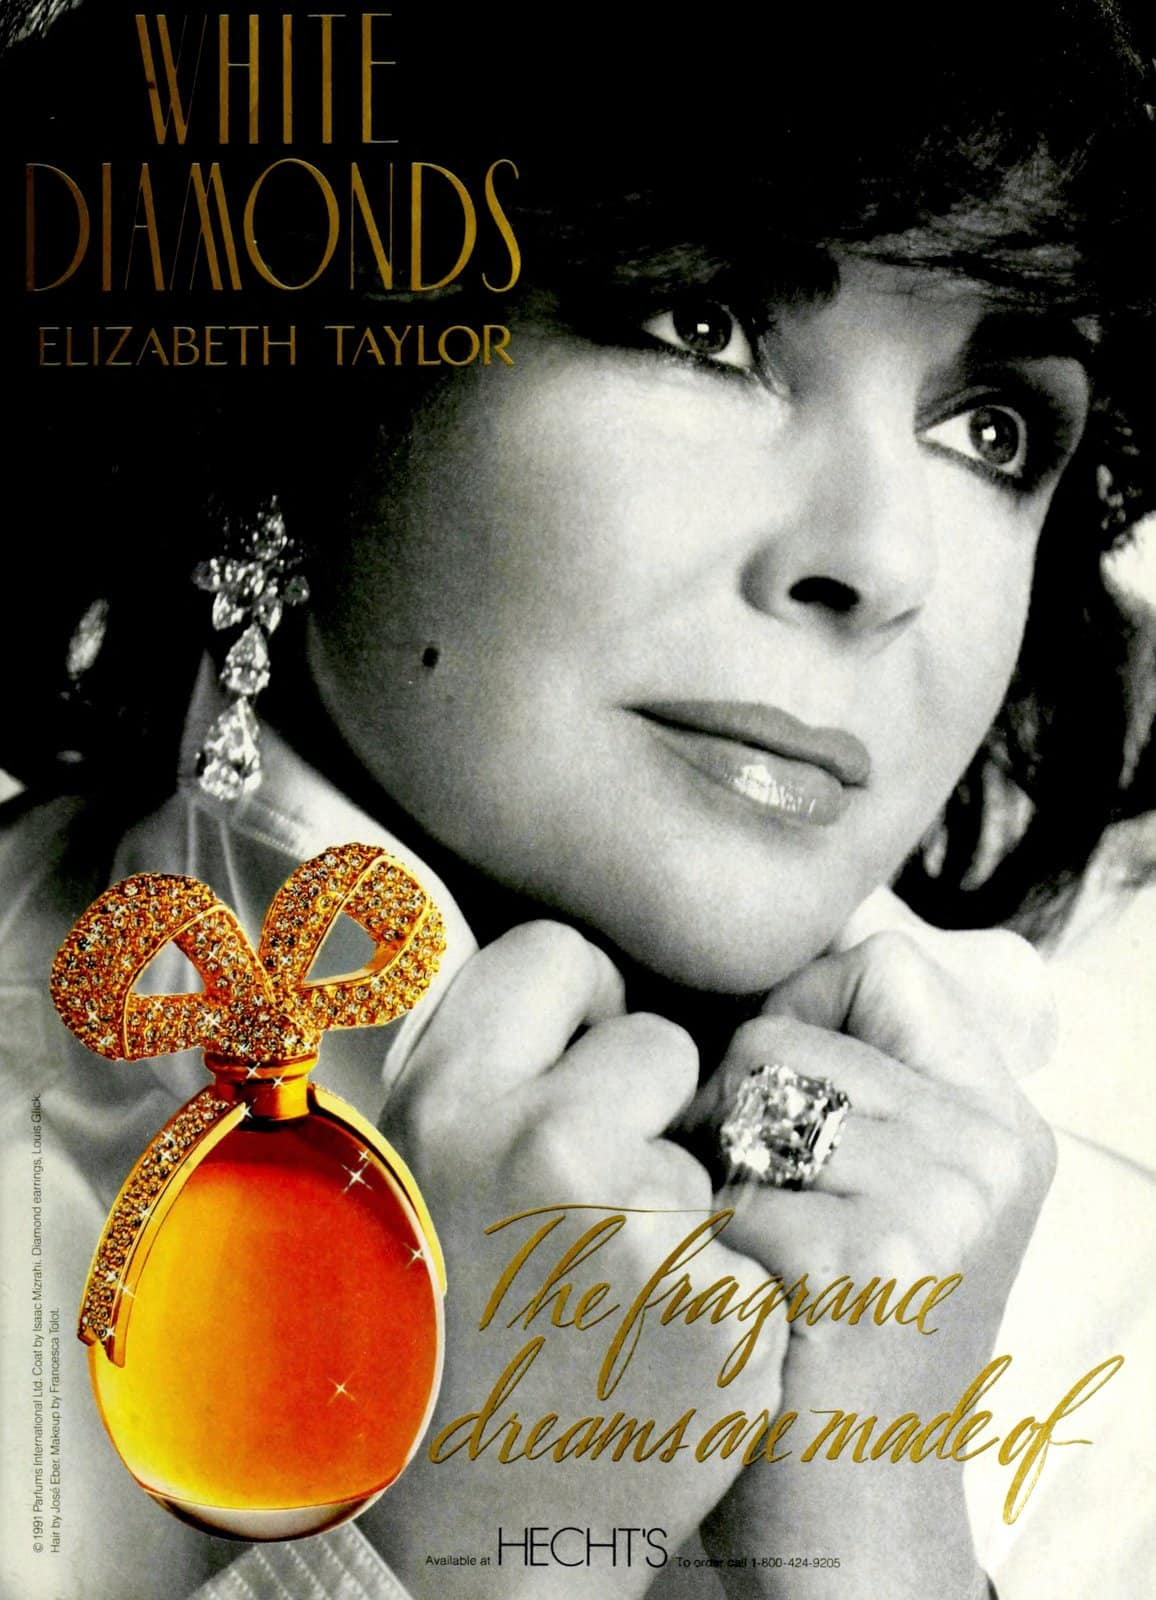 White Diamonds from Elizabeth Taylor (1991) at ClickAmericana.com